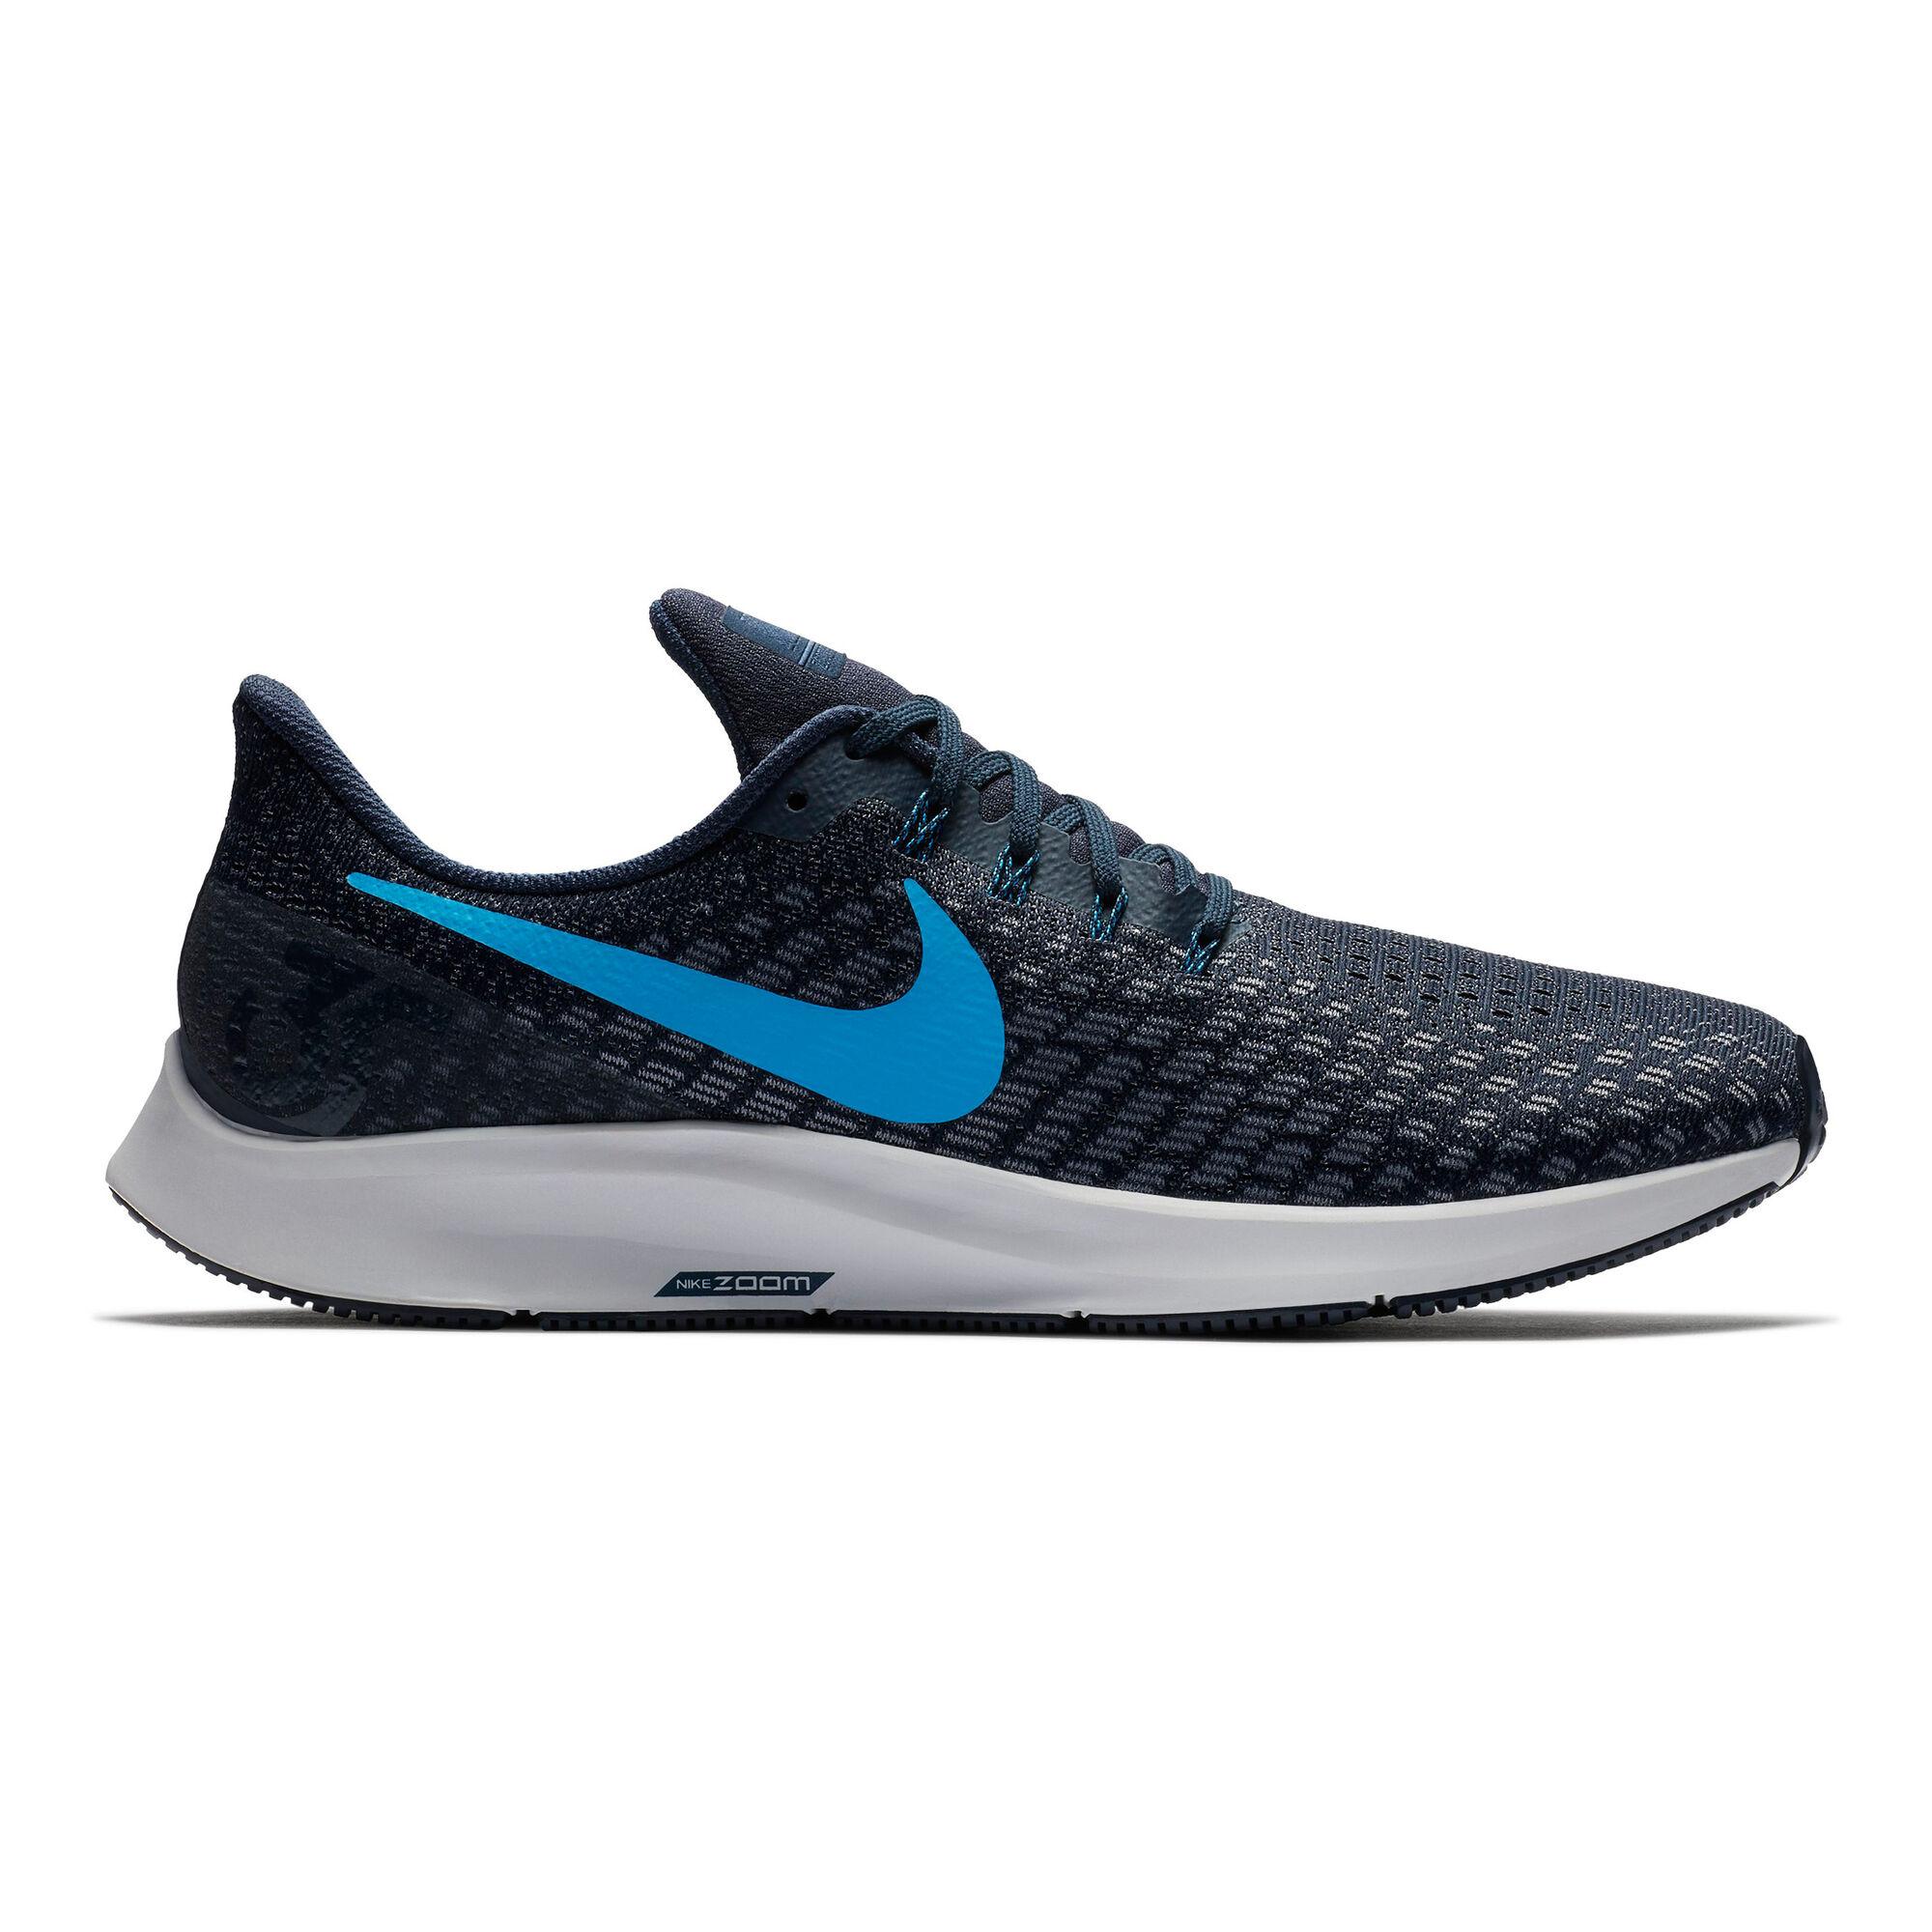 d8fd13274951f buy Nike Air Zoom Pegasus 35 Neutral Running Shoe Men - Dark Blue ...